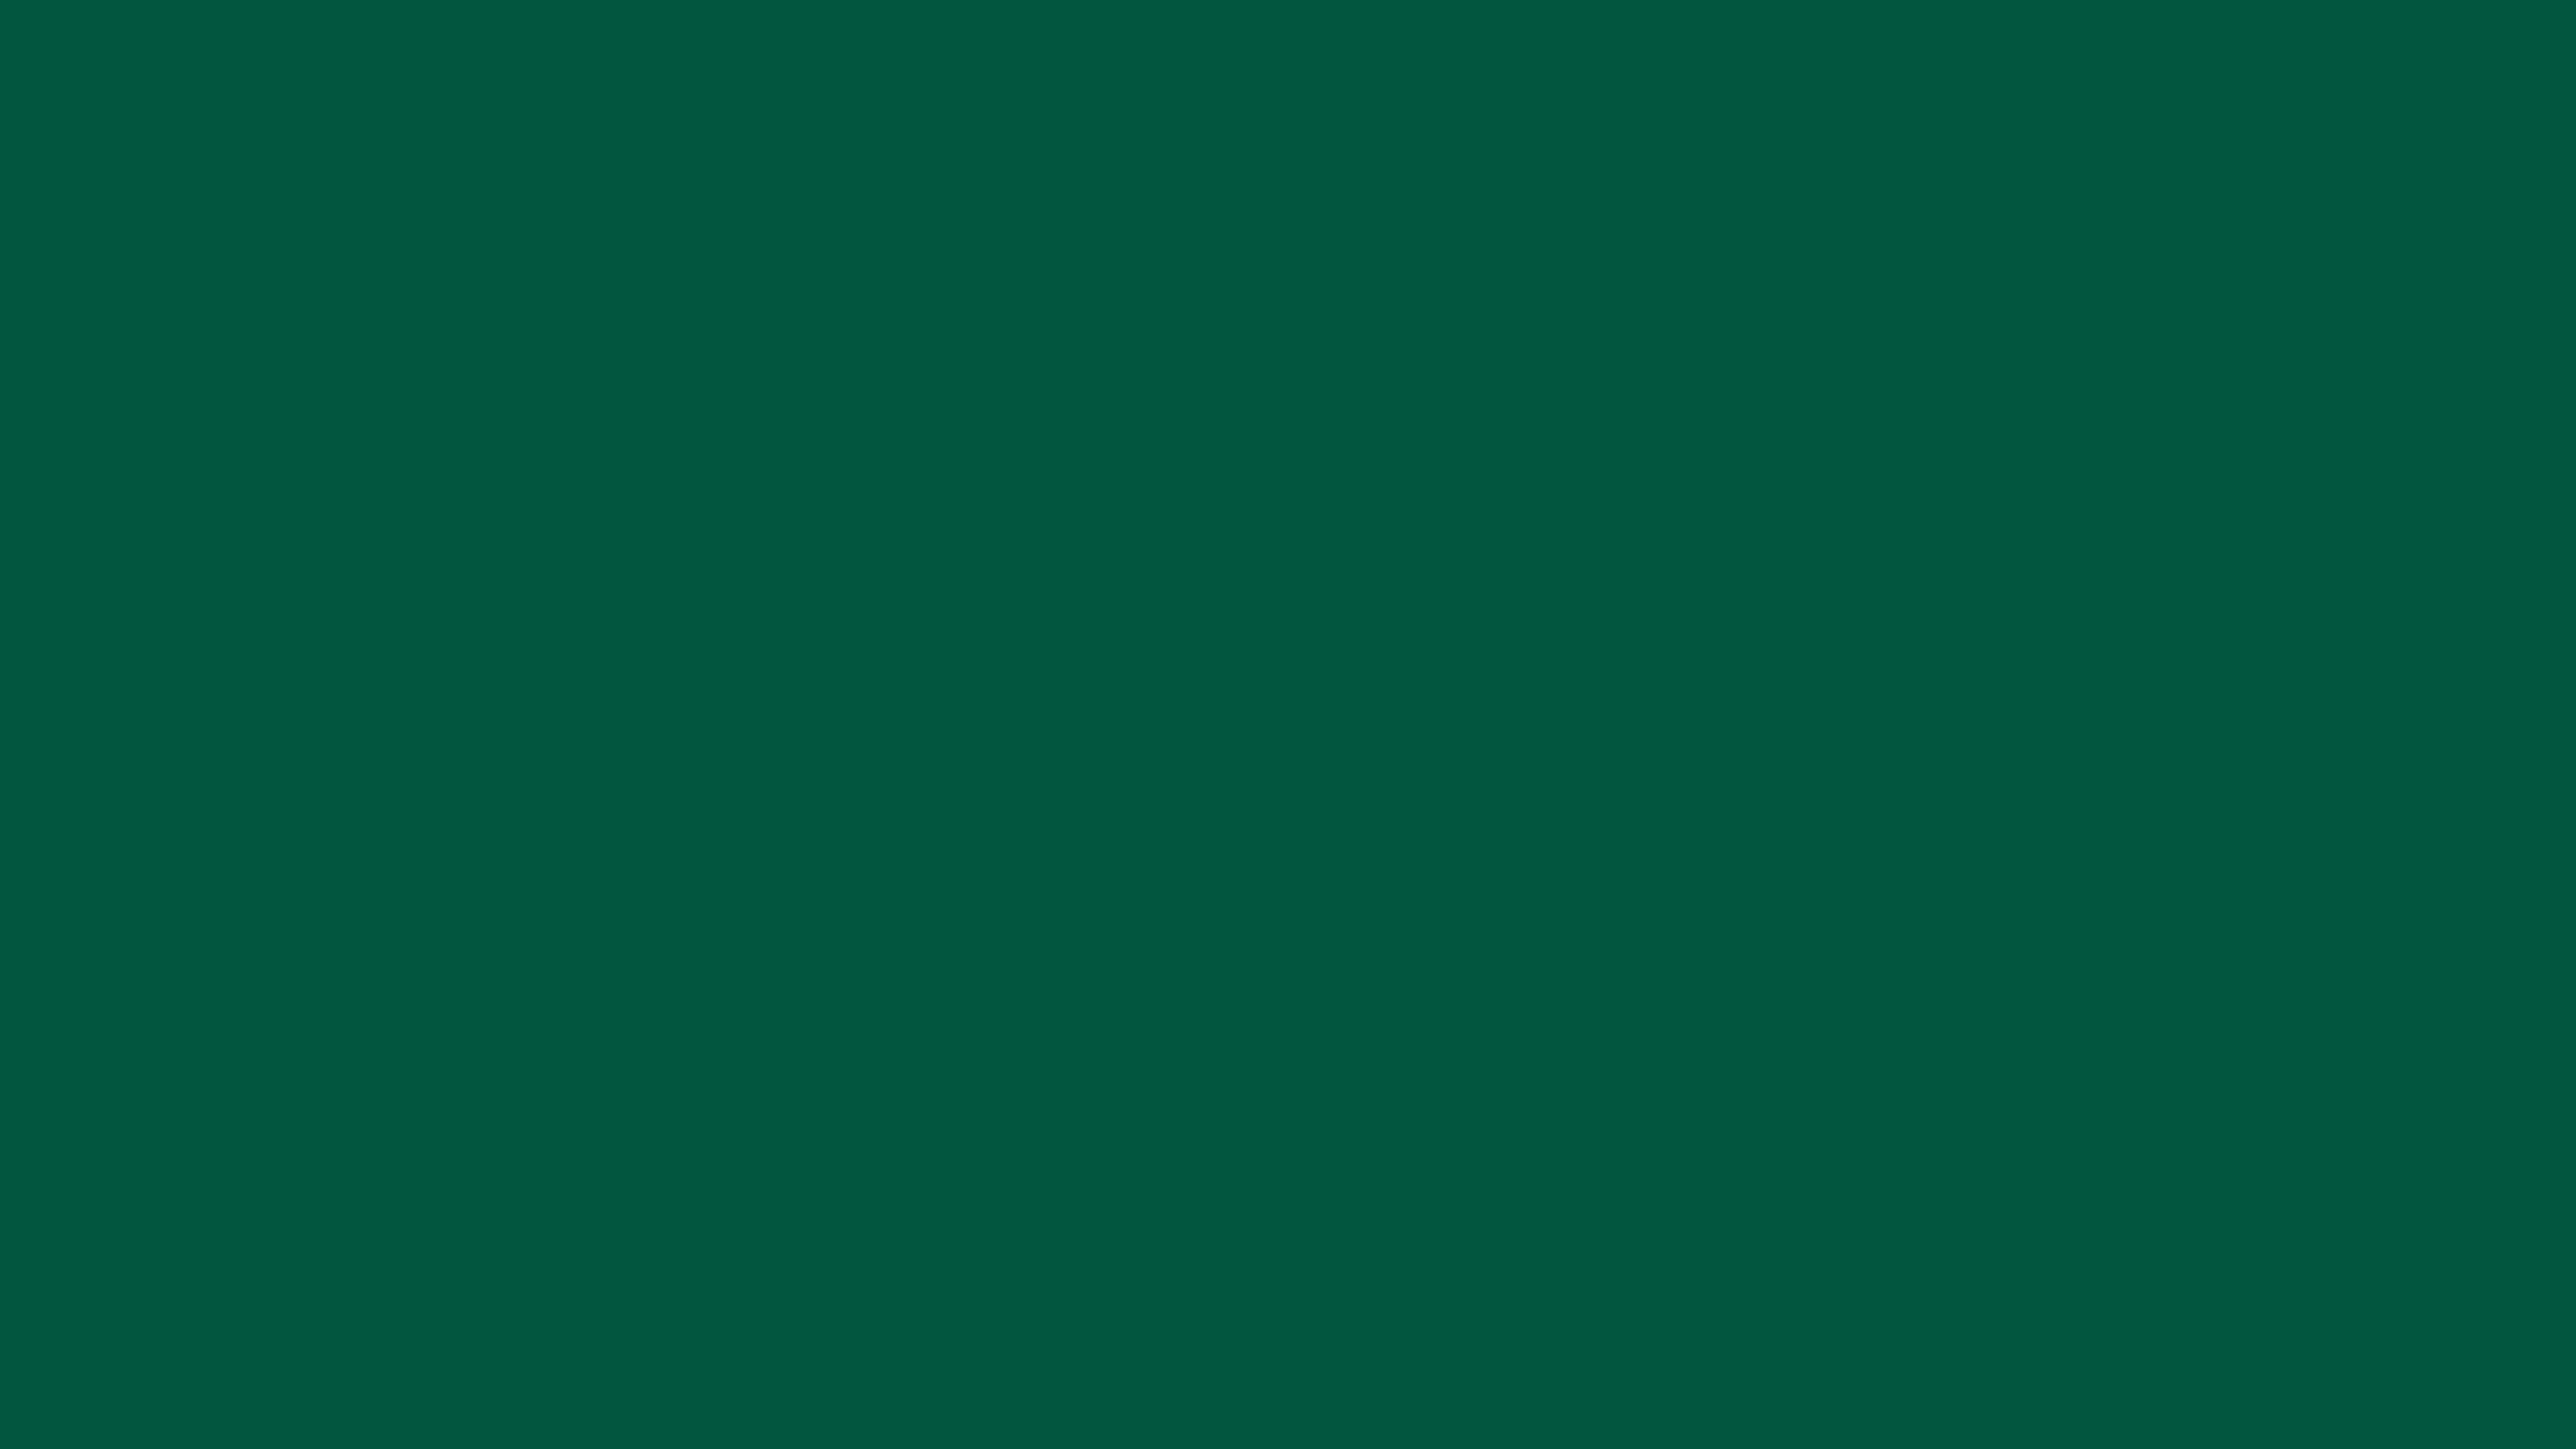 4096x2304 Castleton Green Solid Color Background